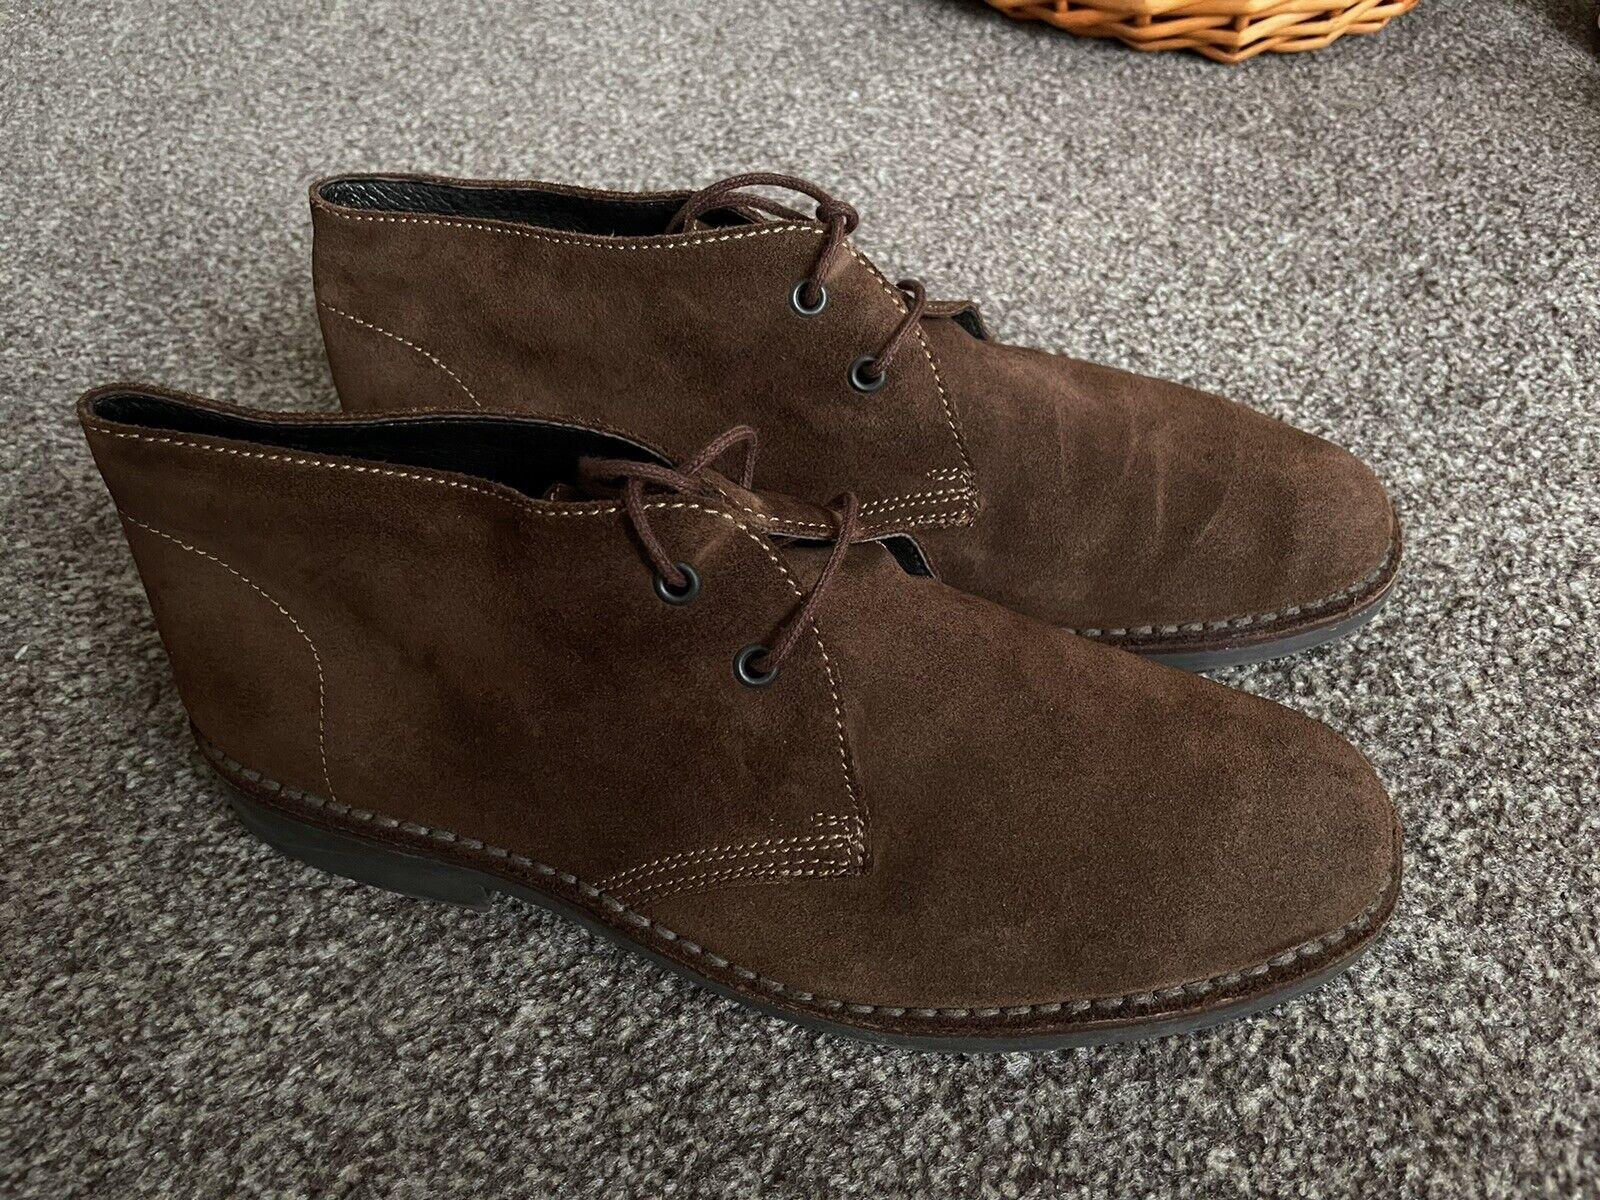 Kebo Dark Brown Men's Desert Boots Suede Size Eu42 UK8 RRP Clarks Shoes